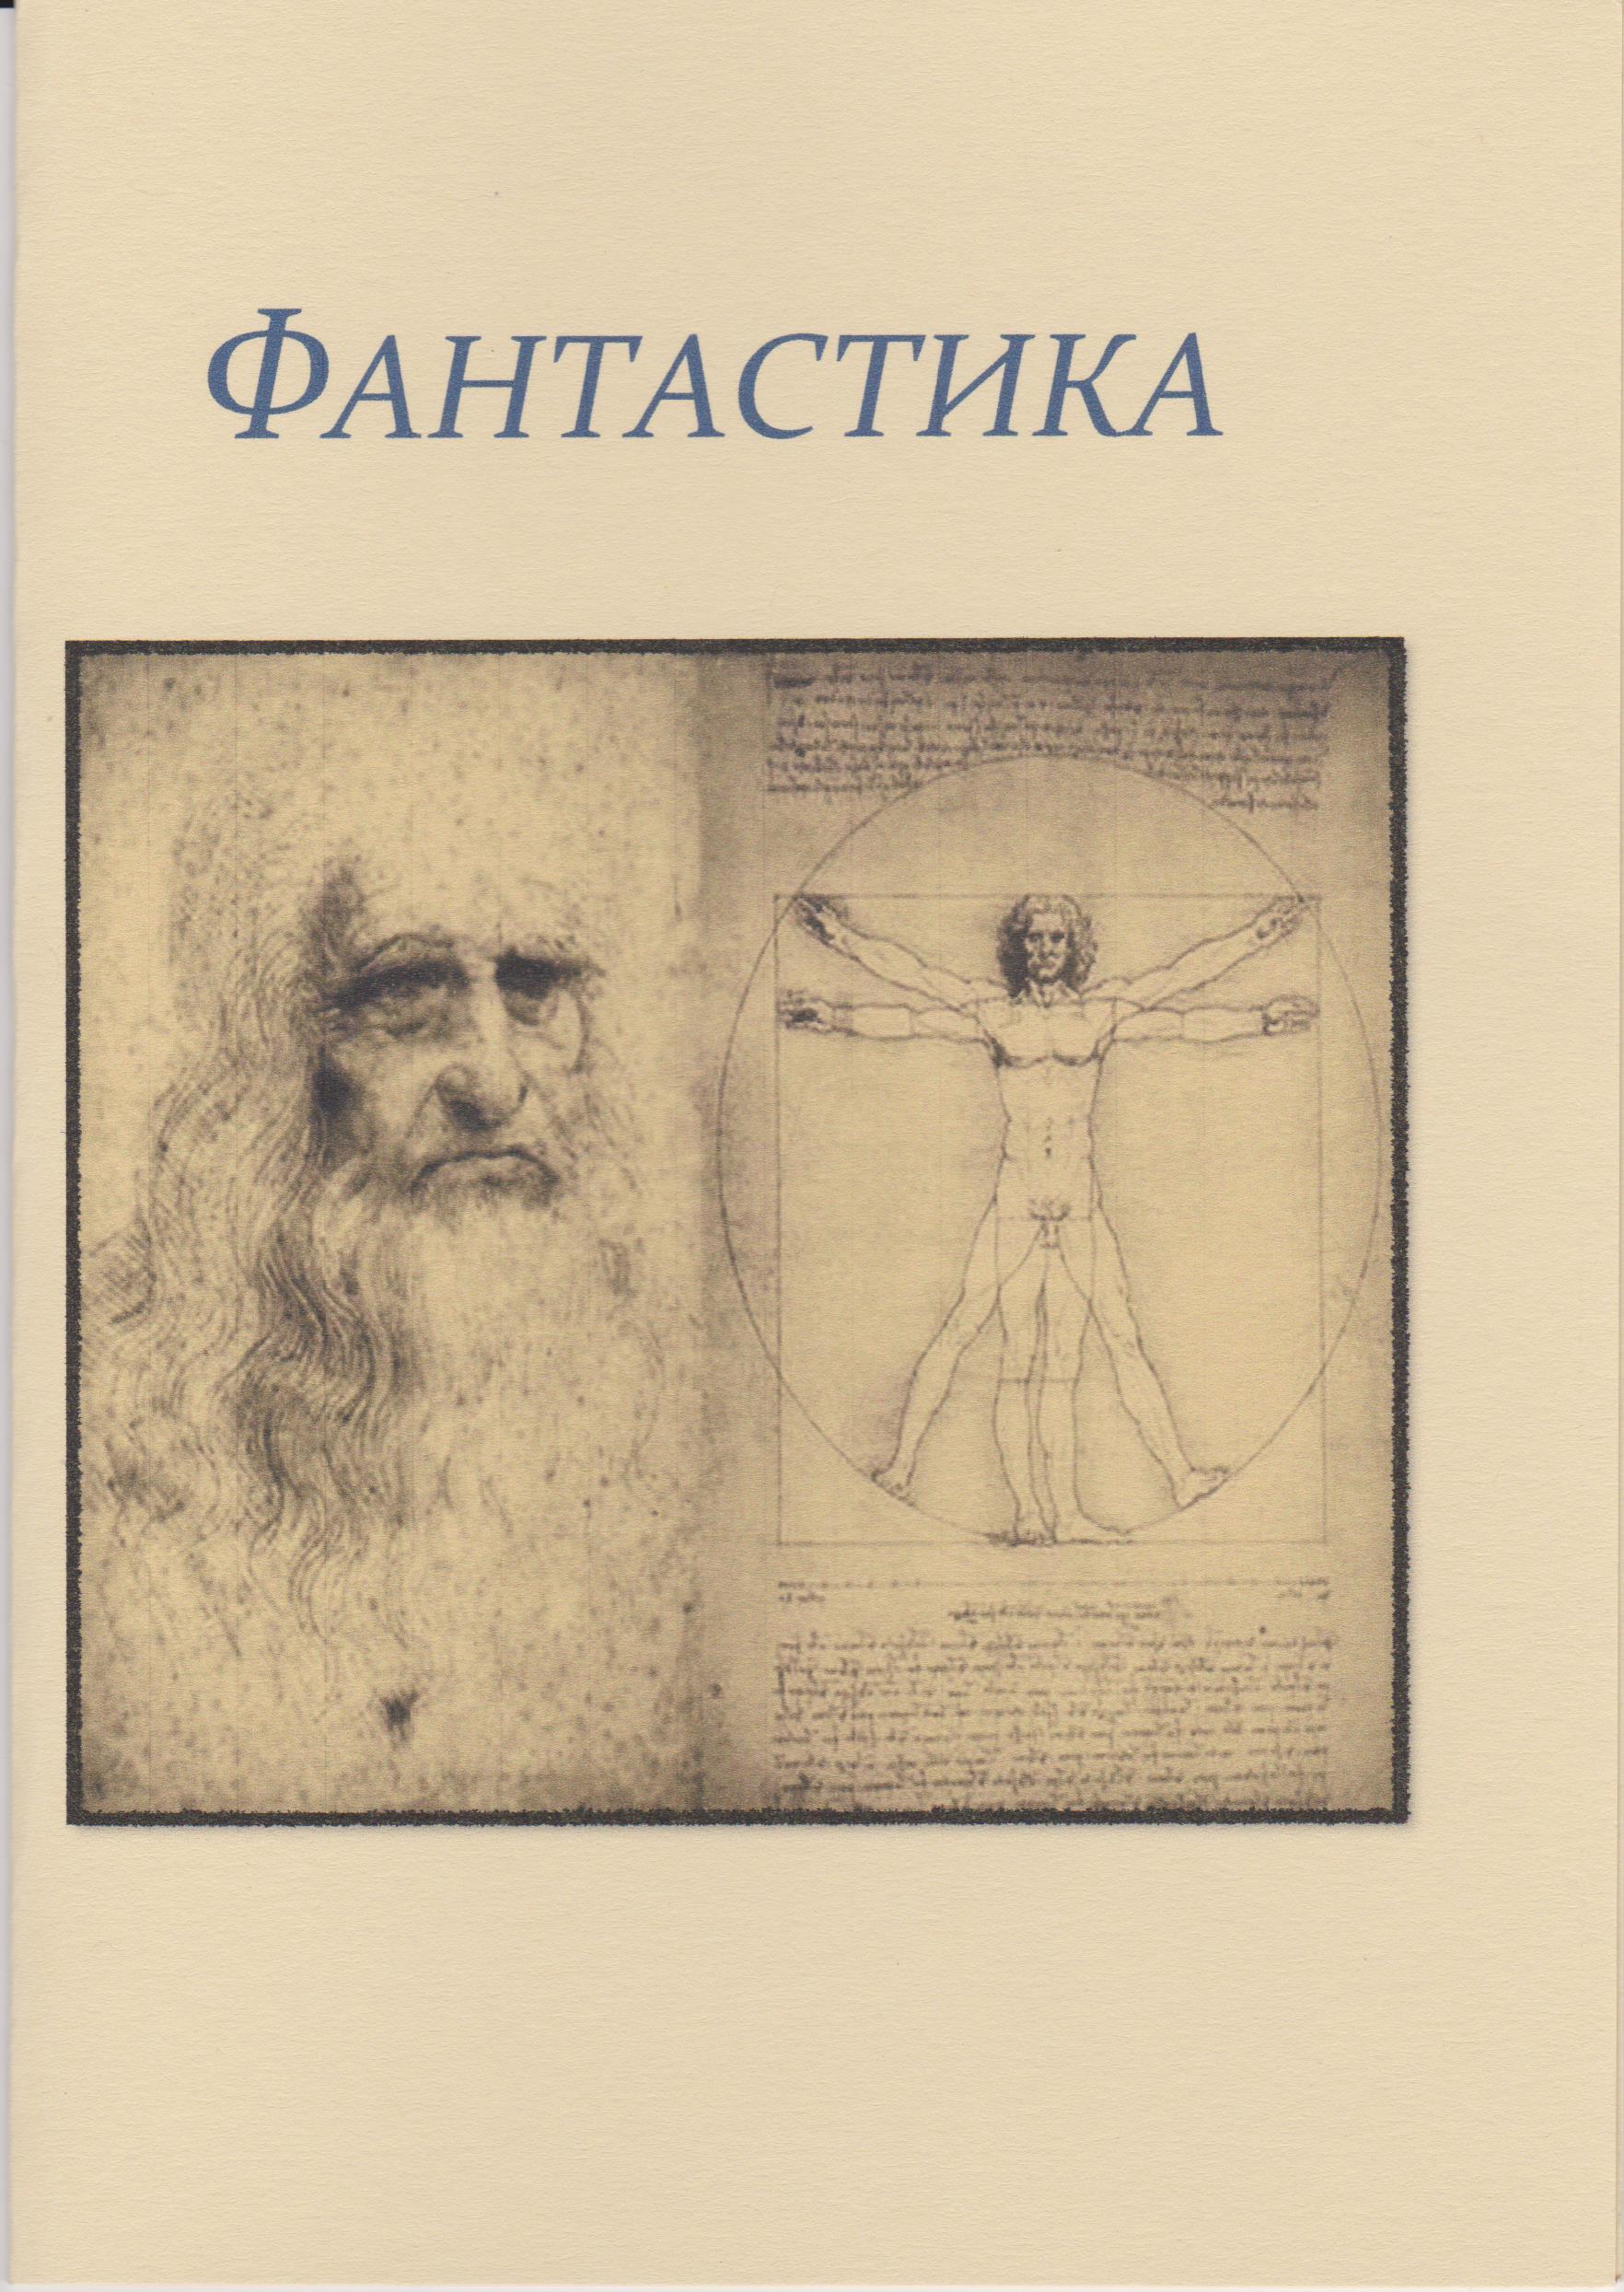 фэнтези,библиоподиум,симферополь,библиотека-филиал17 жукова,шушкова ирина